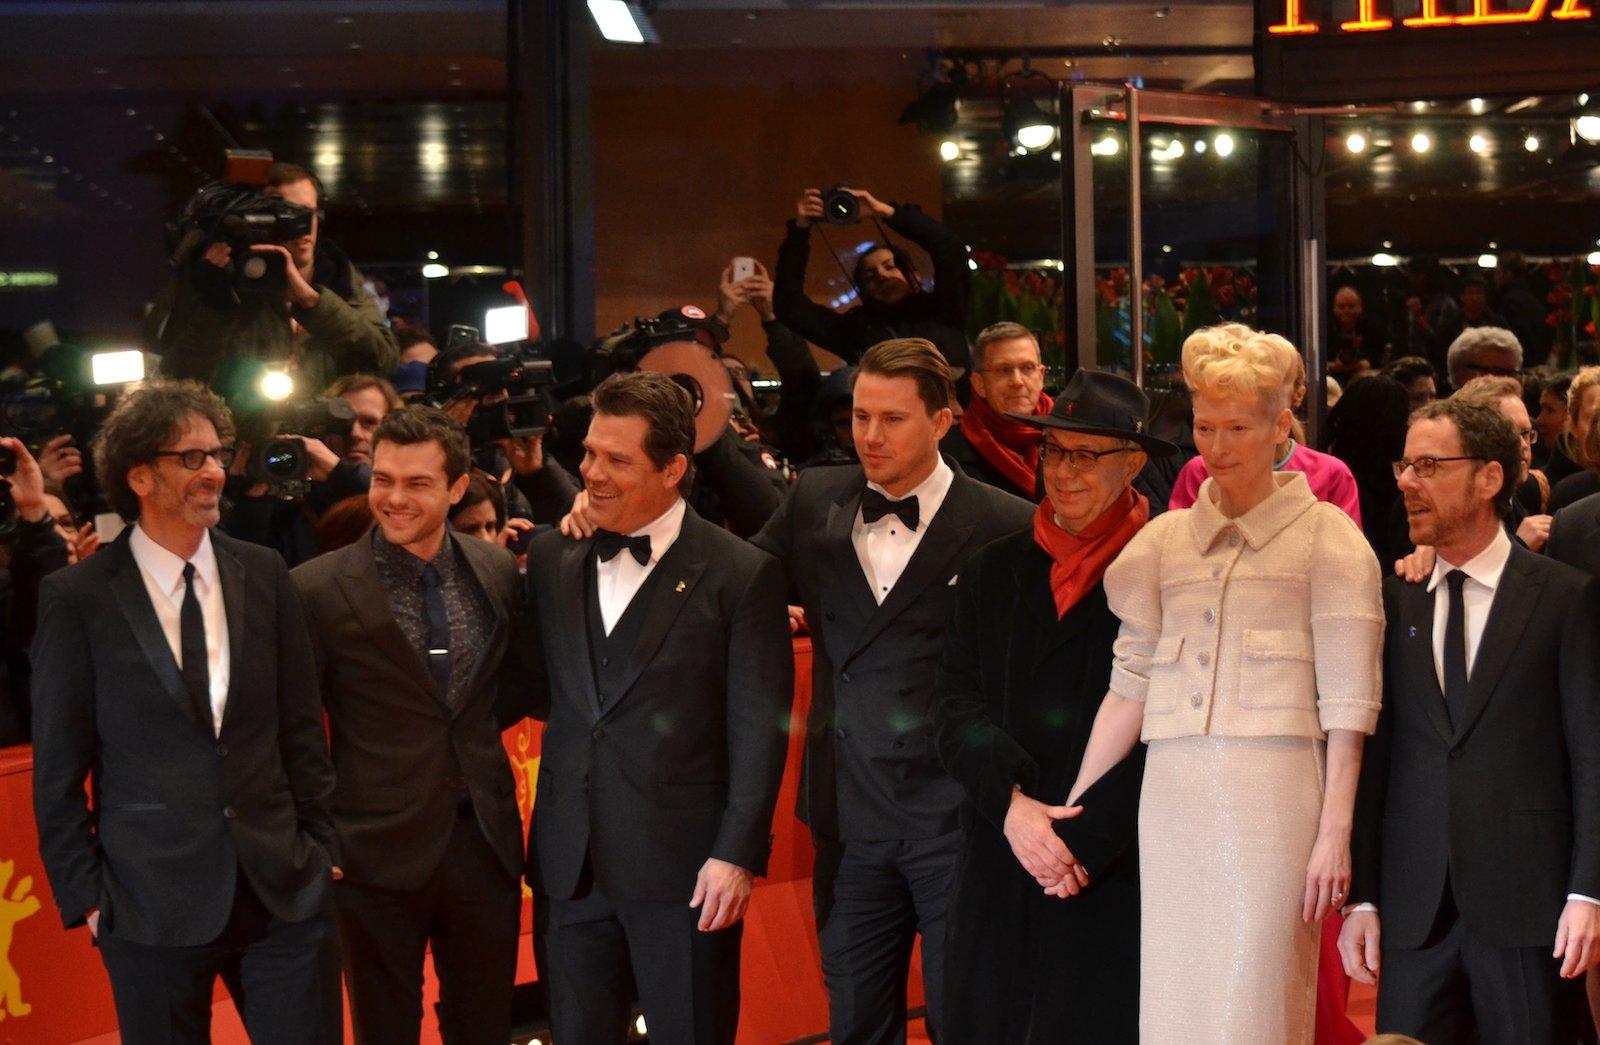 Berlino 2016: Tilda Swinton, Alden Ehrenreich, Josh Brolin, Channing Tatum, Joel e Ehan Coen,  sul red carpet di Ave, Cesare!